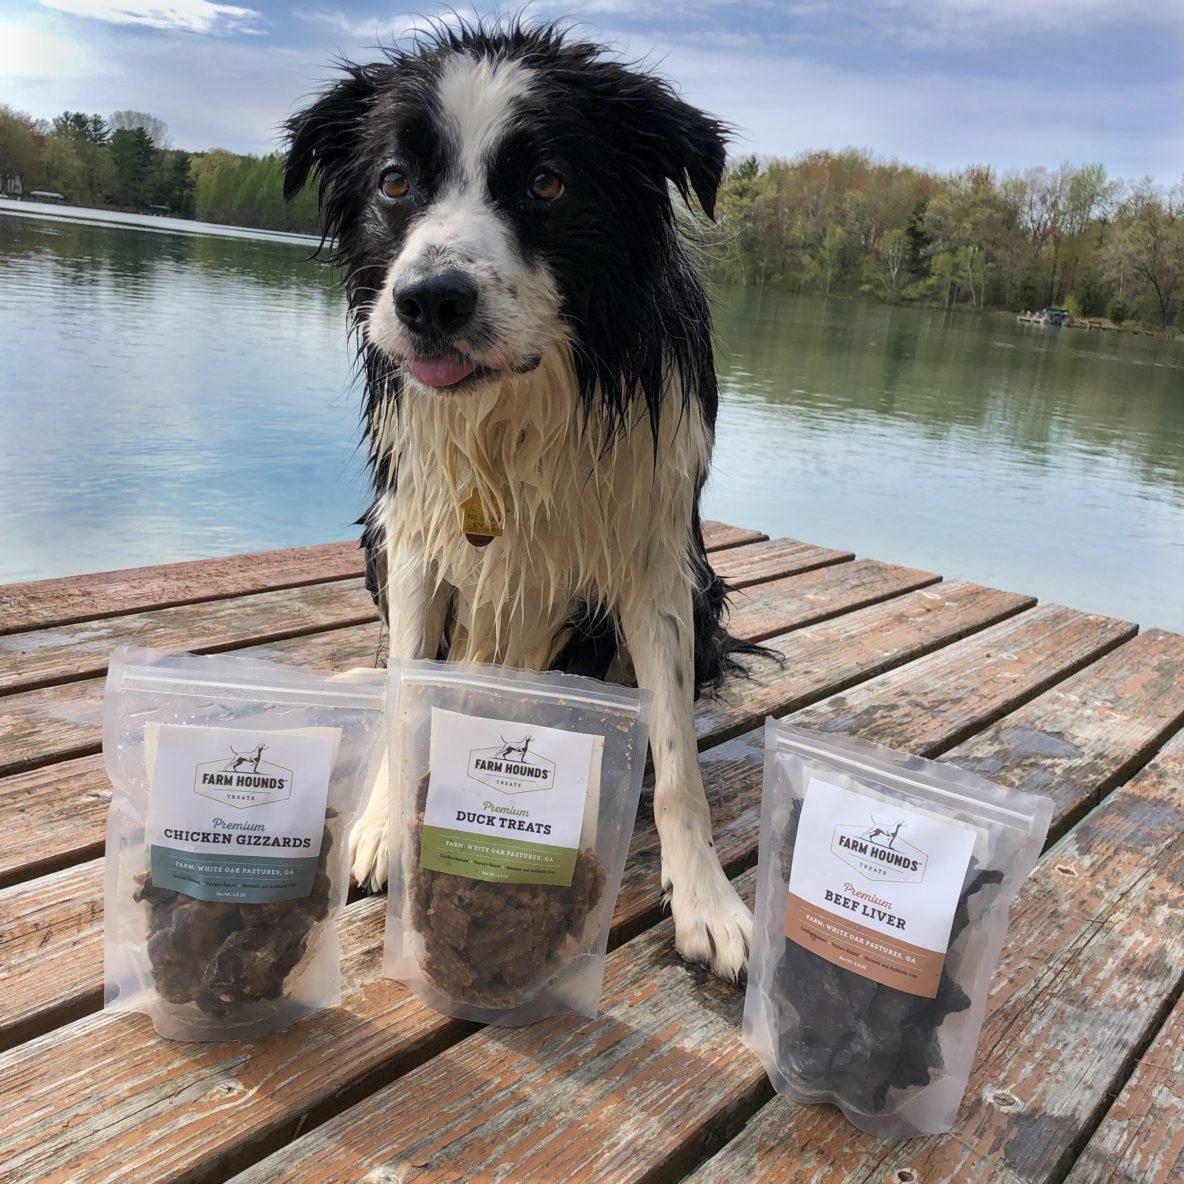 farm hounds treat review